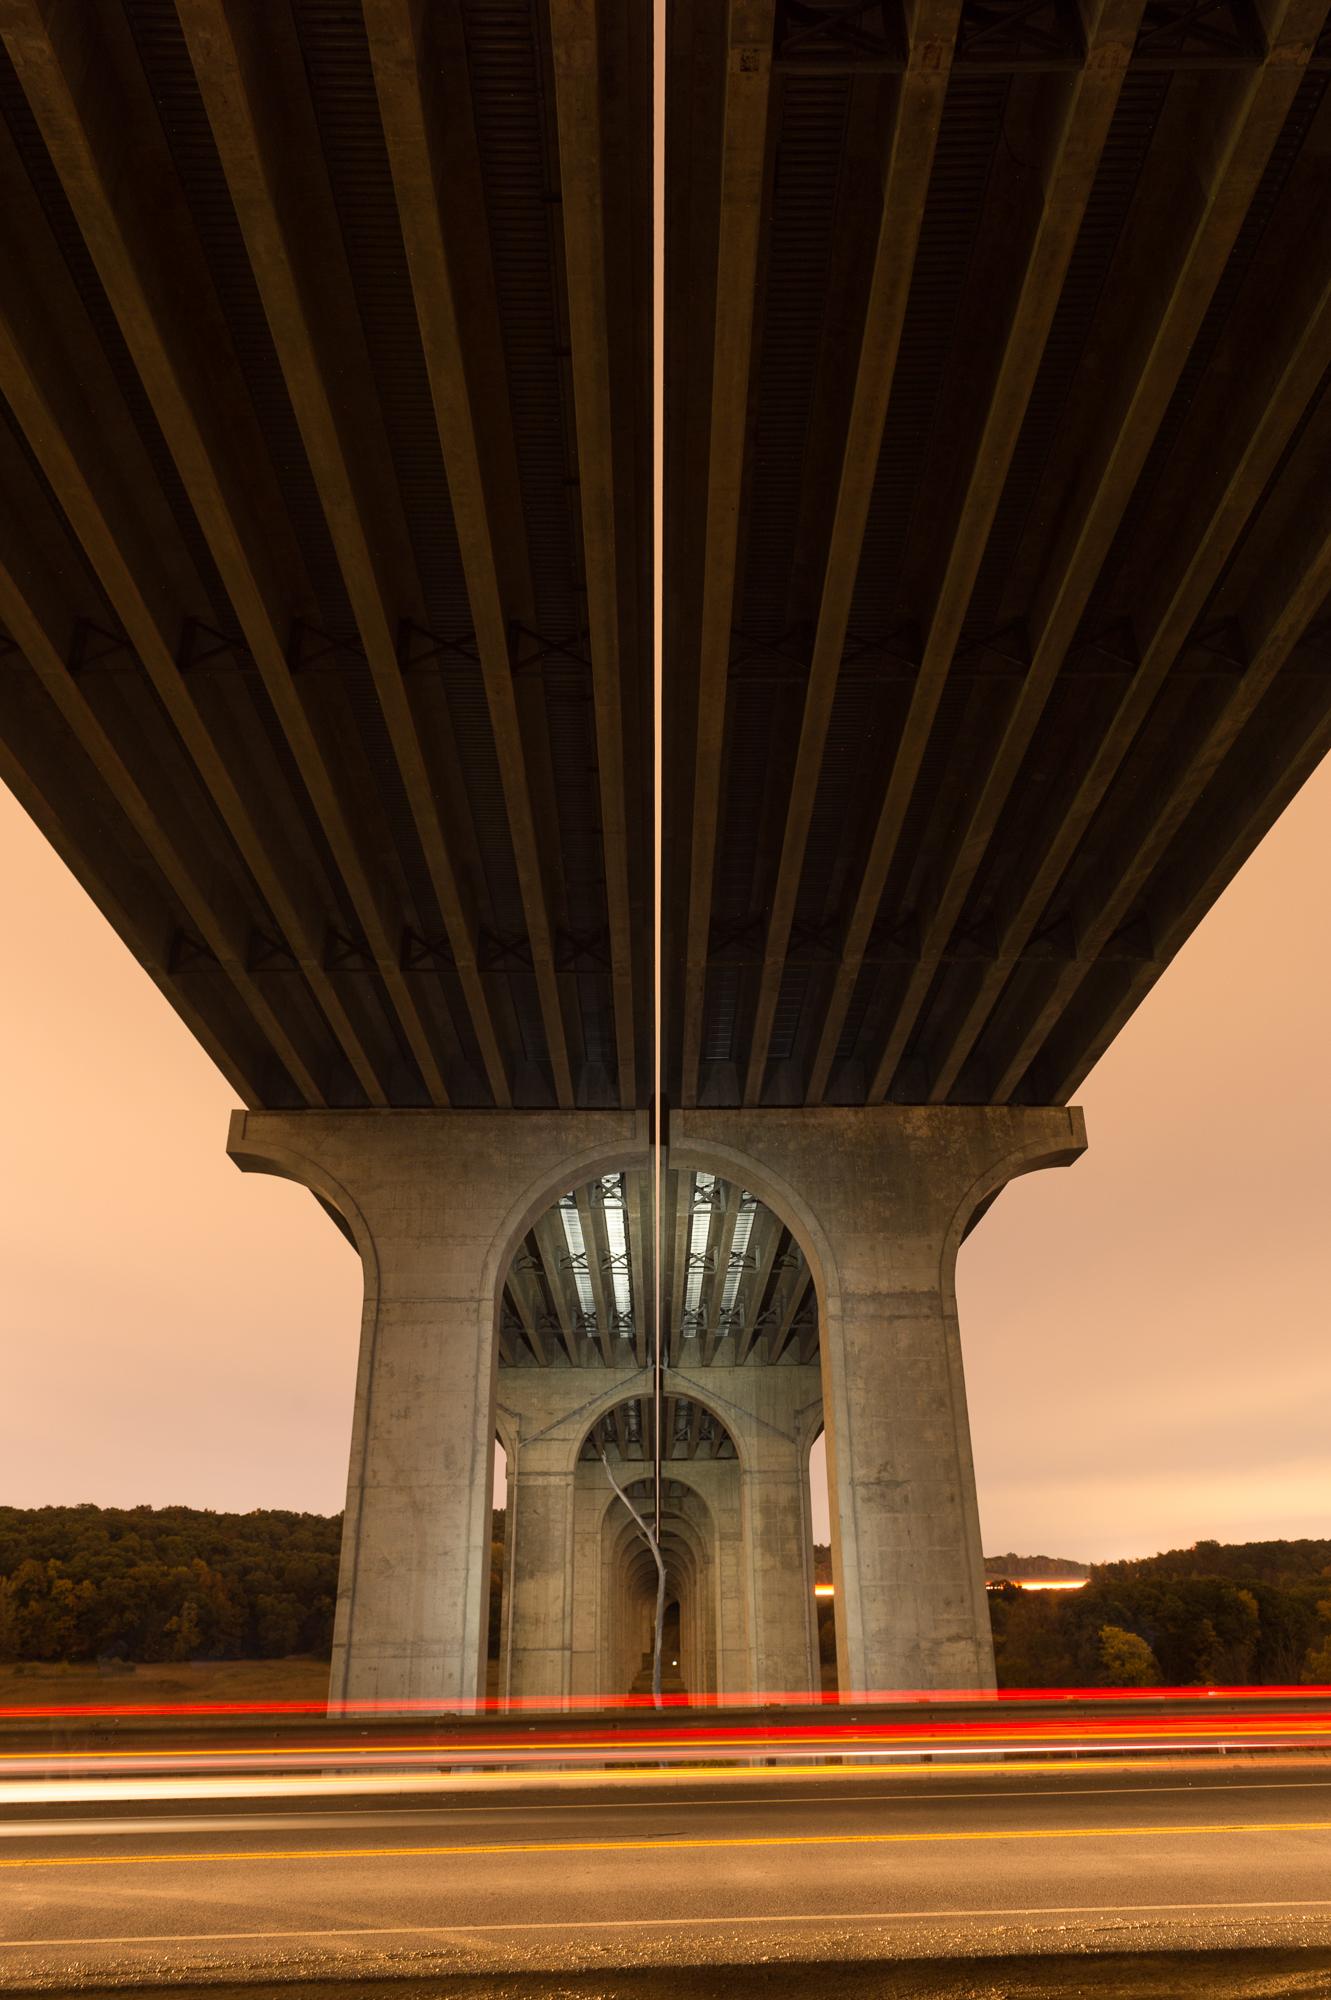 Figure 4: Light painting bridge piers